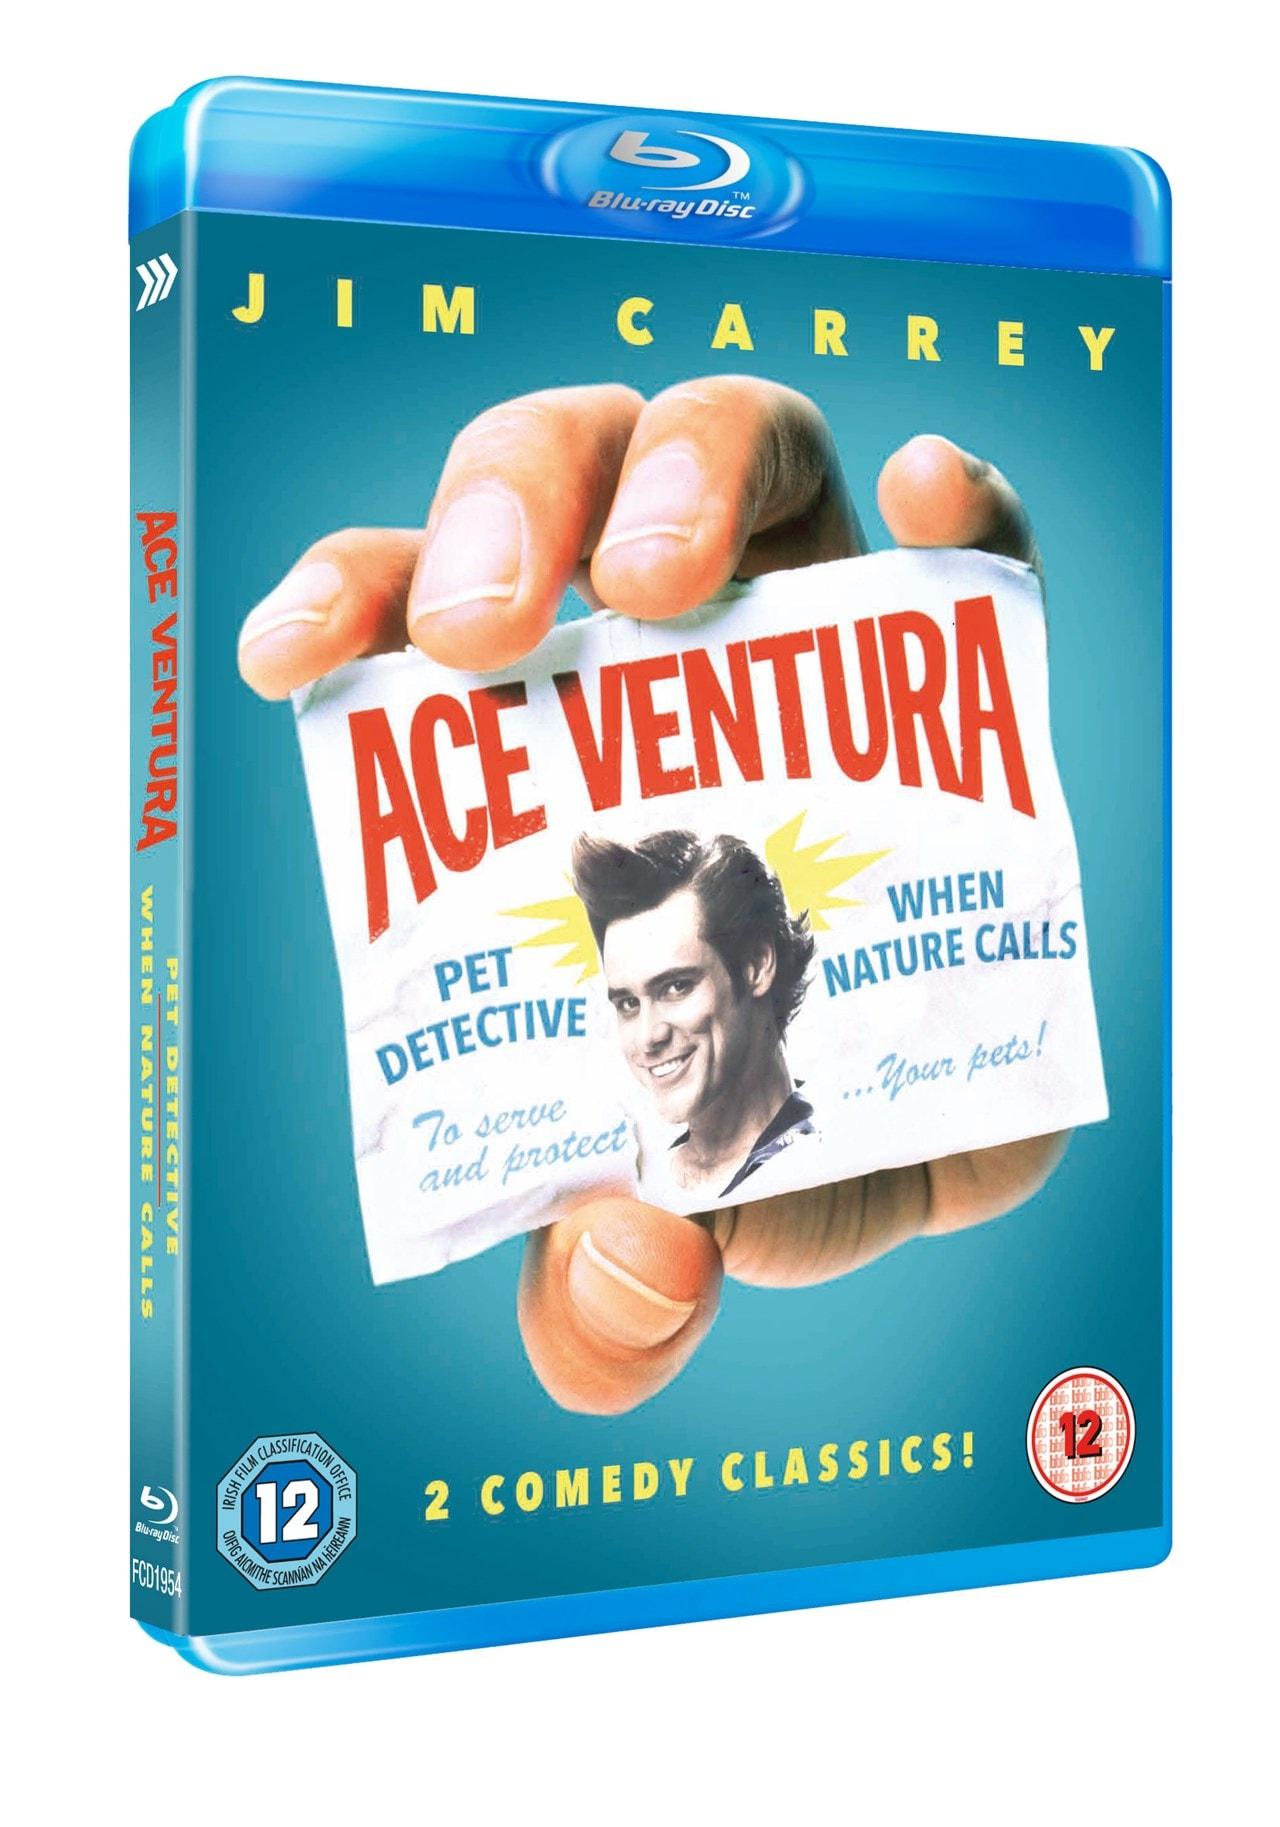 Ace Ventura: Pet Detective/Ace Ventura: When Nature Calls - 2